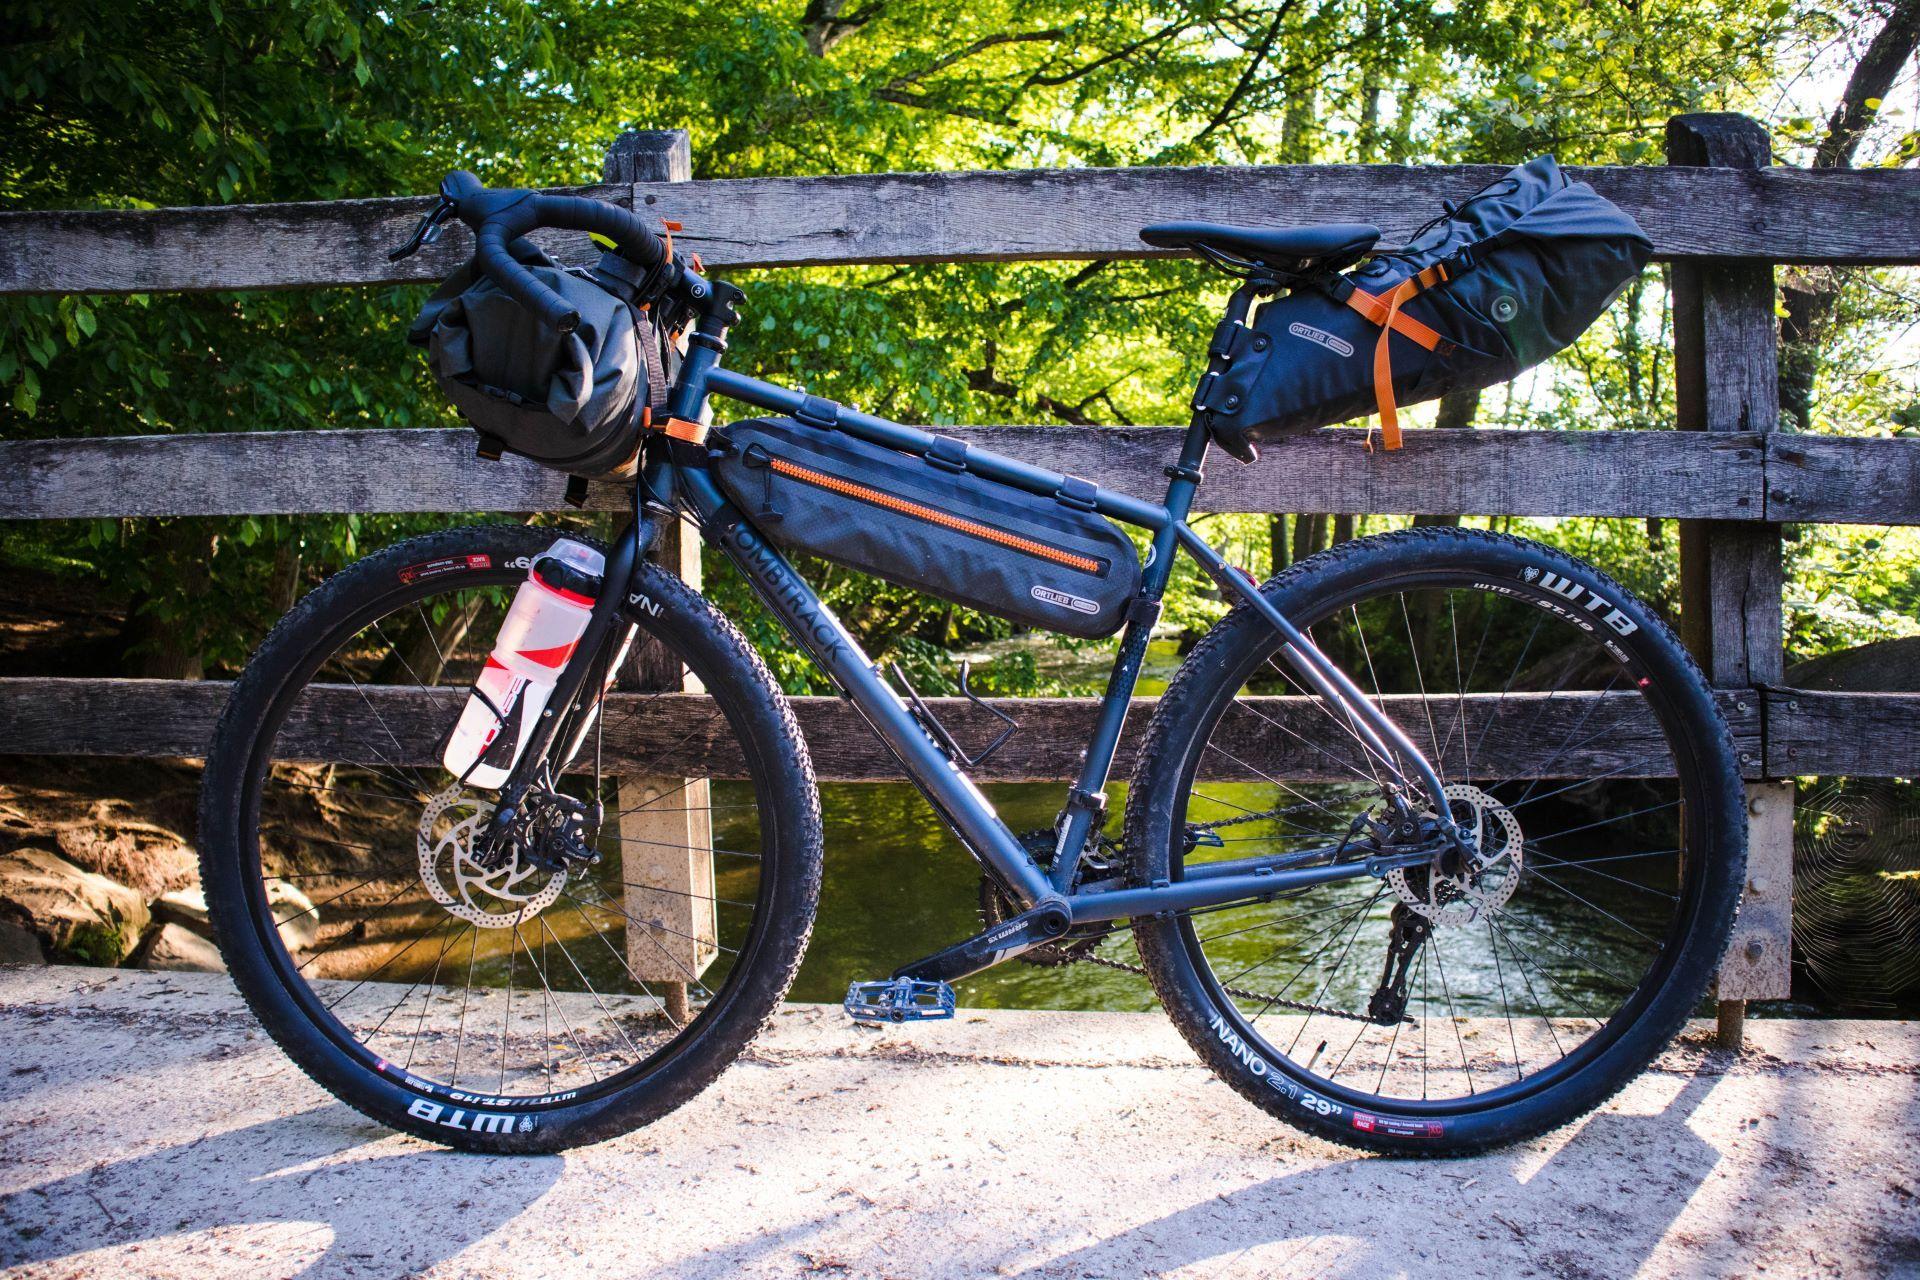 Ortlieb Bikepacking bag set in long-term test (Update: New models in practical test)